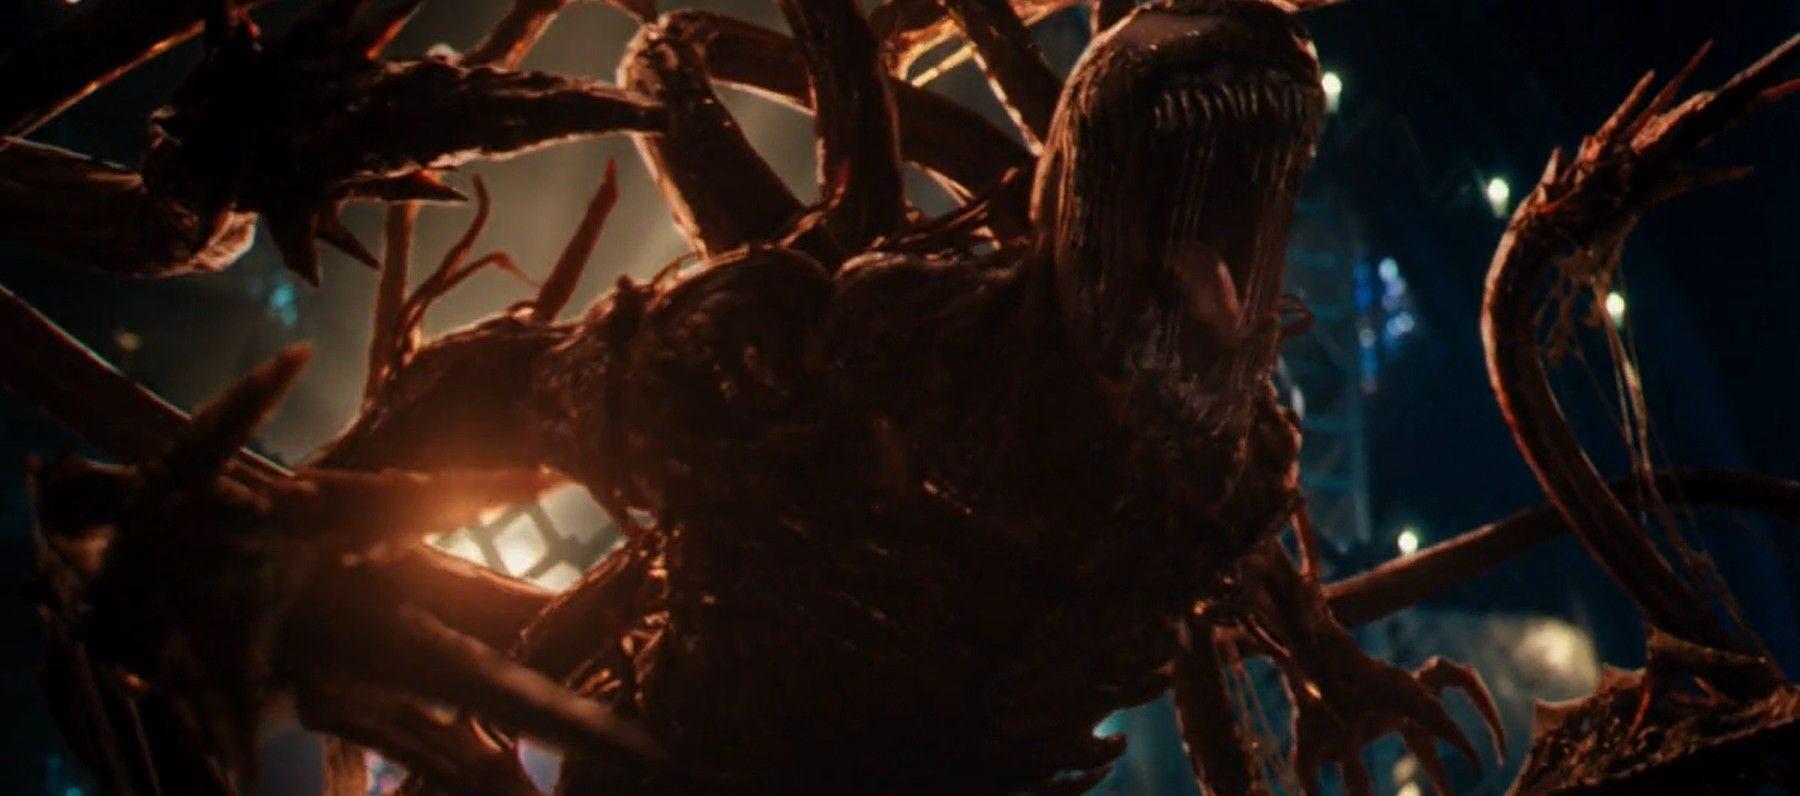 Carnage Venom primo trailer